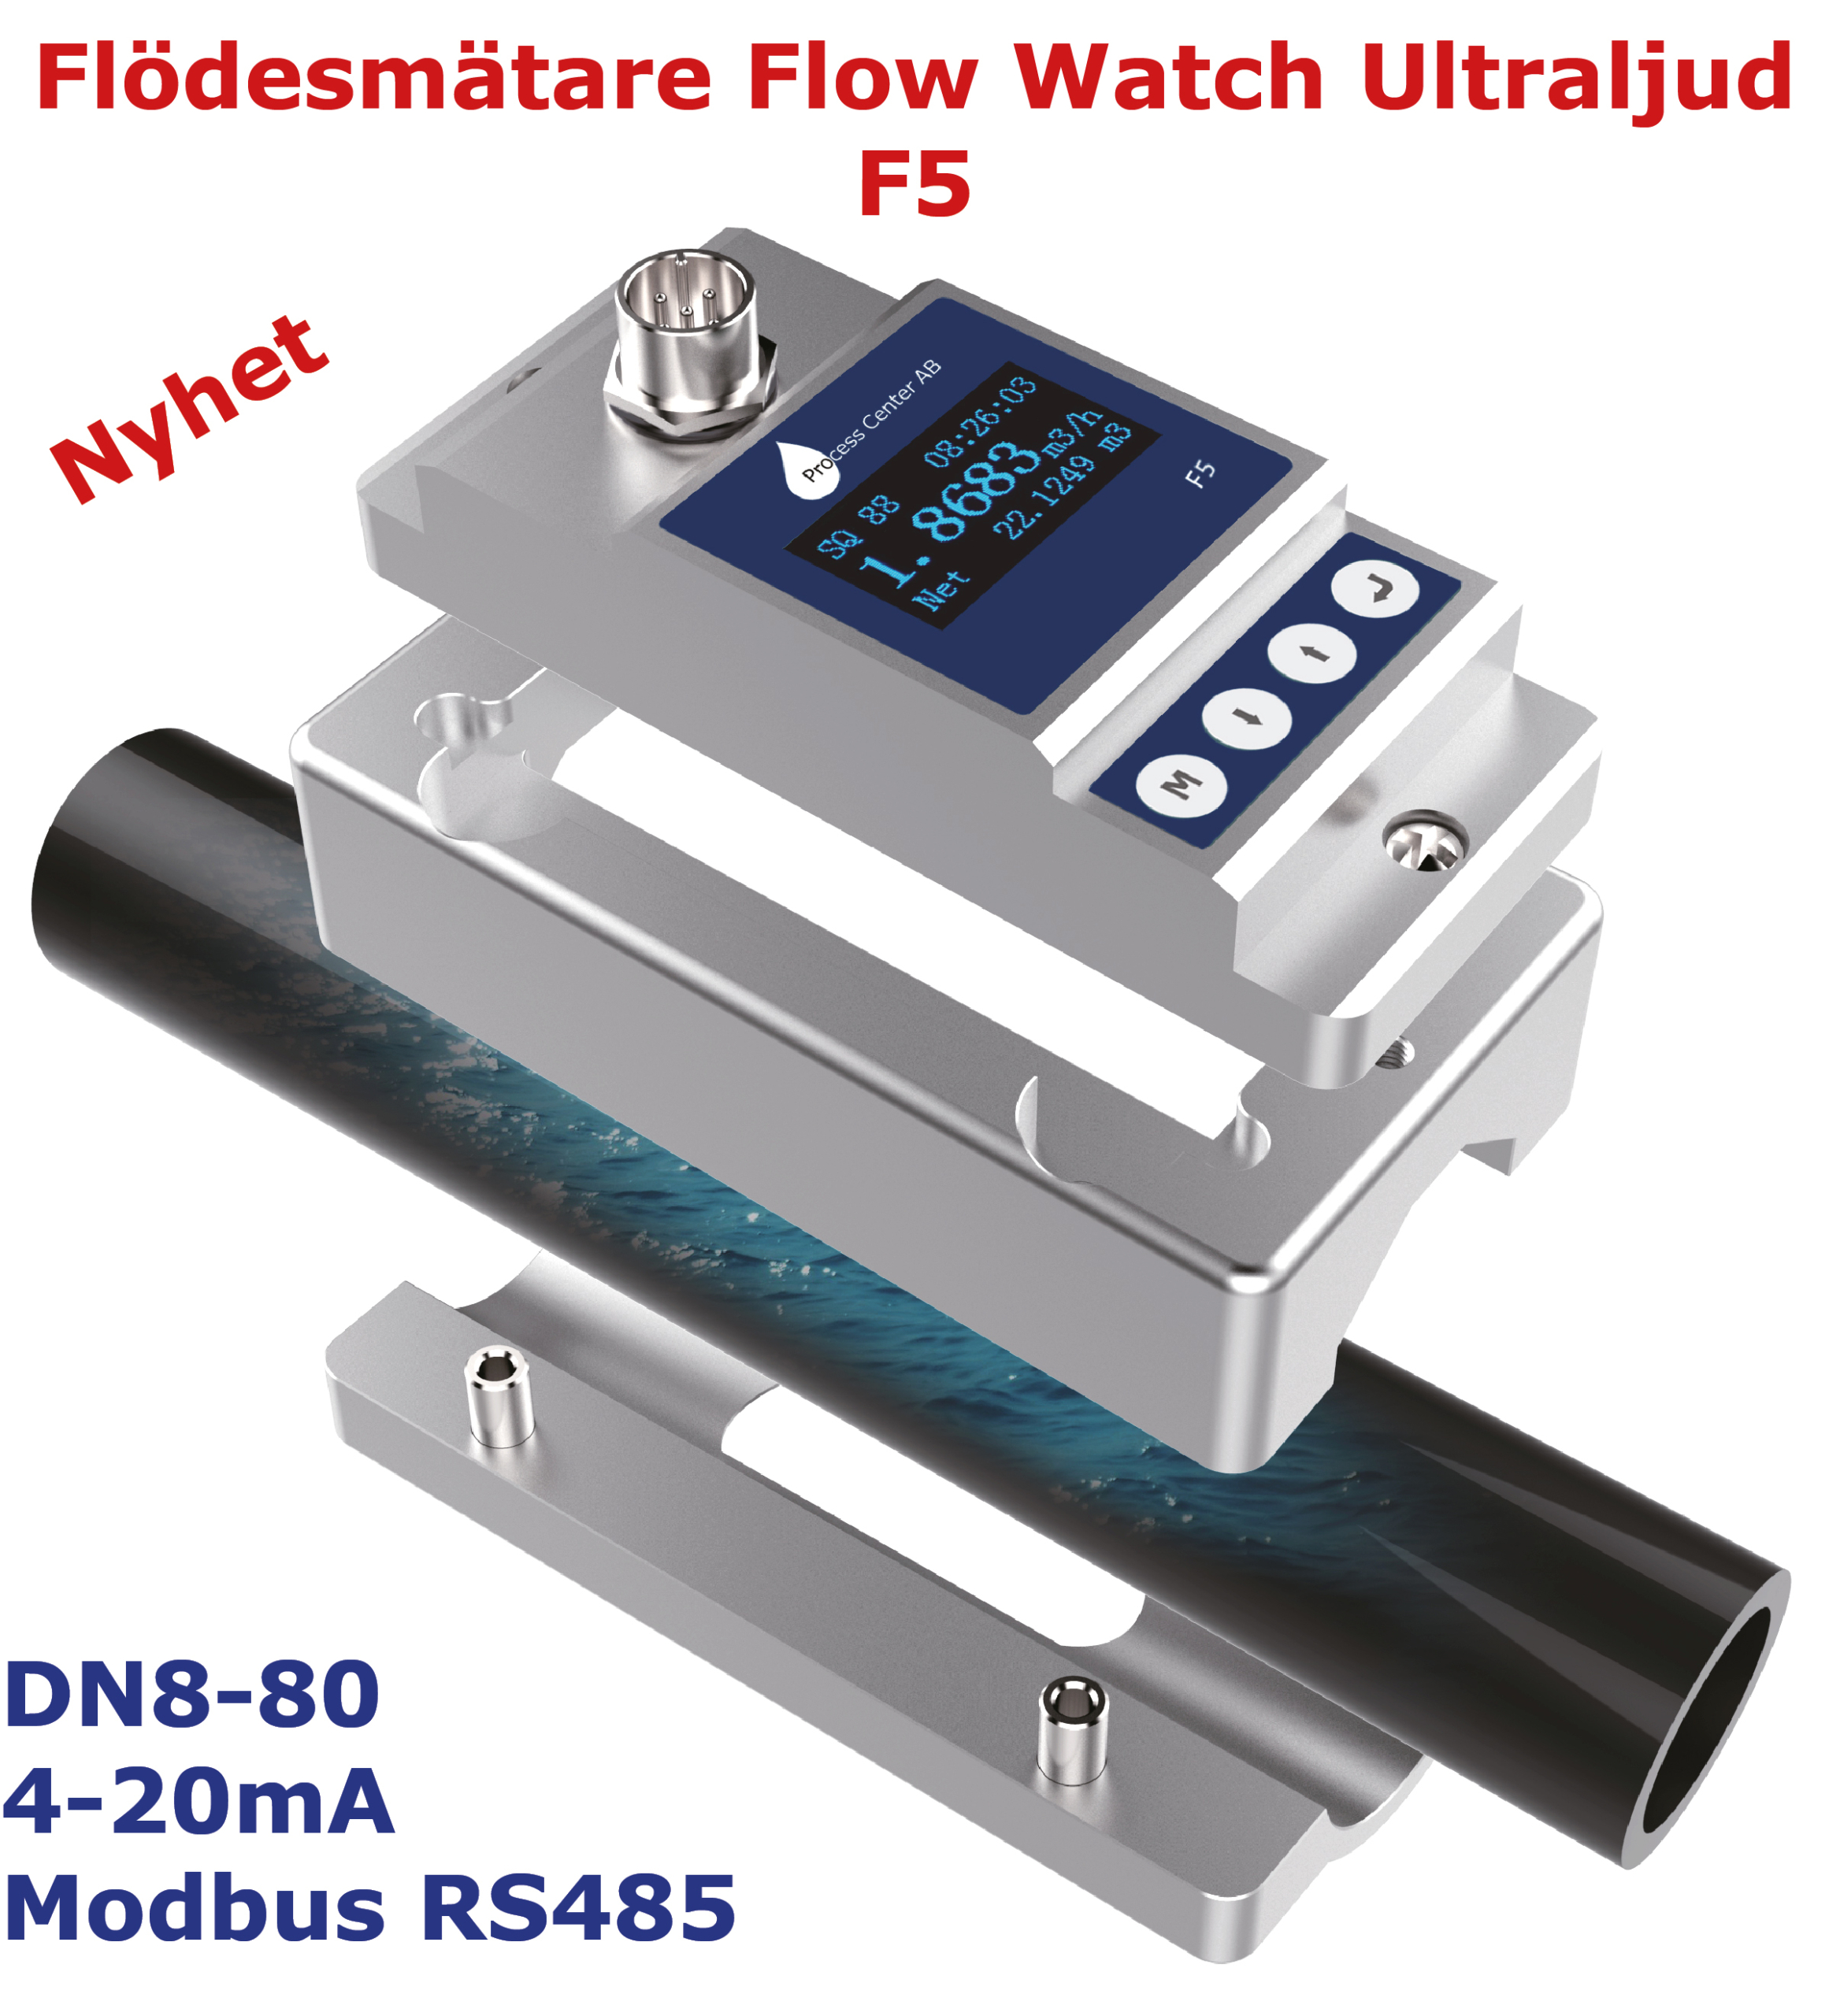 Flödesmätare Clamp On Ultraljud Flow Watch